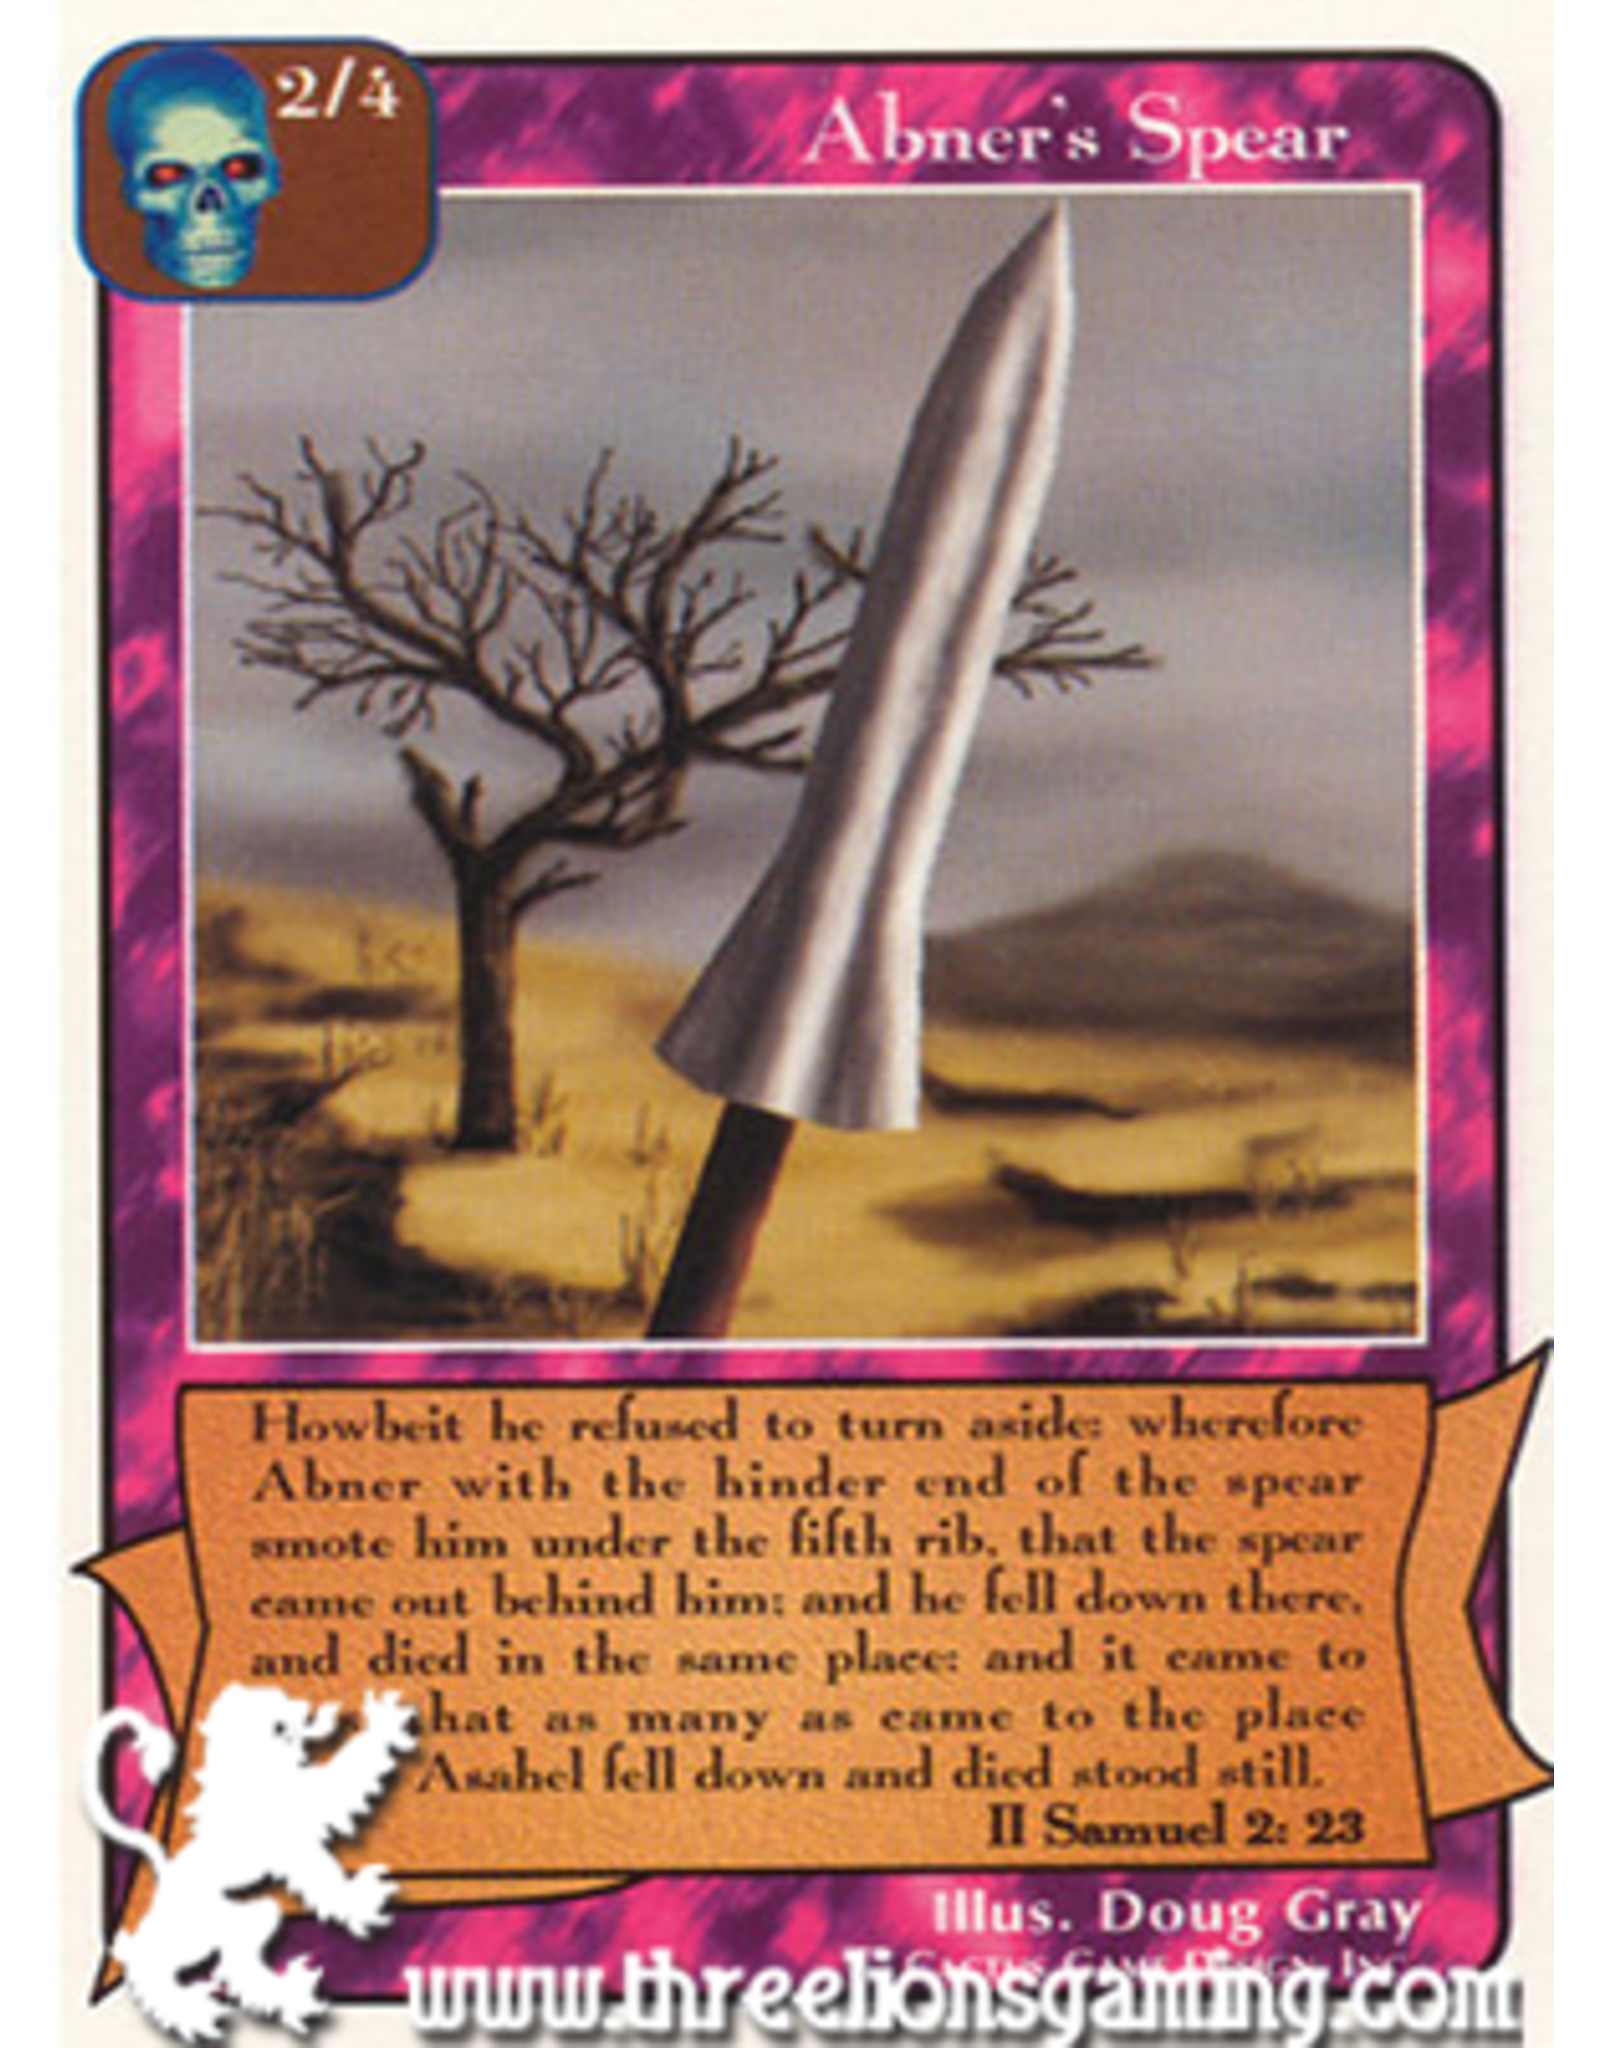 Wa: Abner's Spear